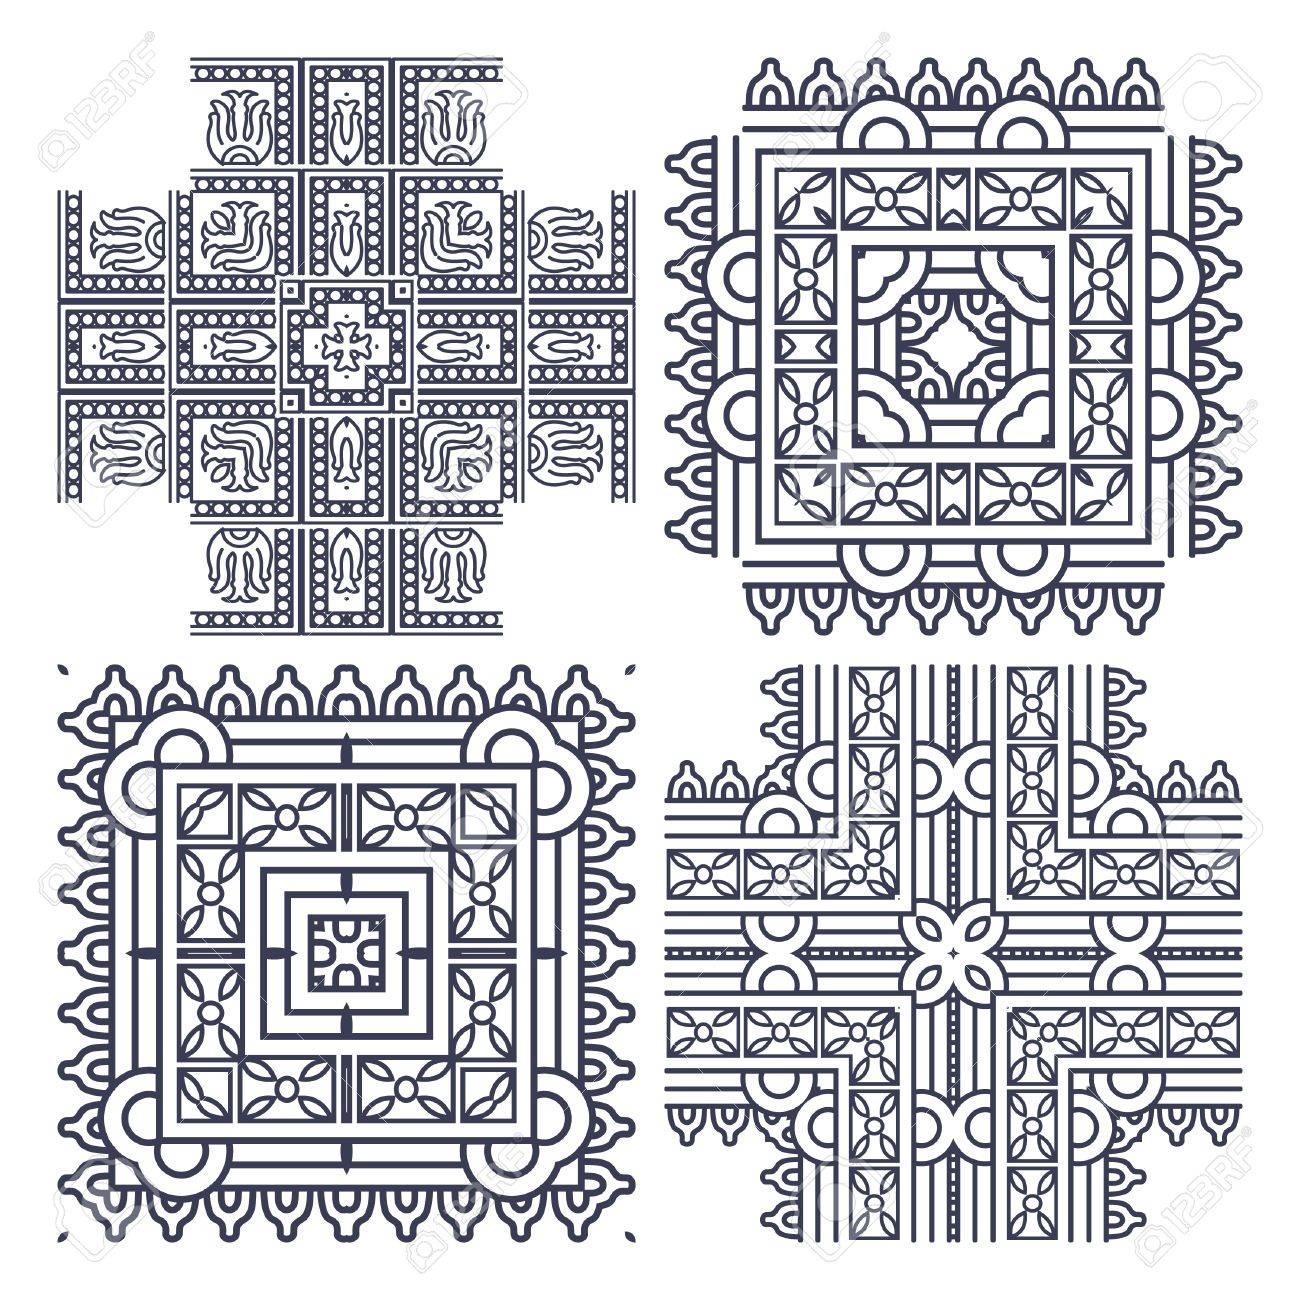 Wallpaper with aztec ornament in gray colors, design element Stock Vector - 13204996